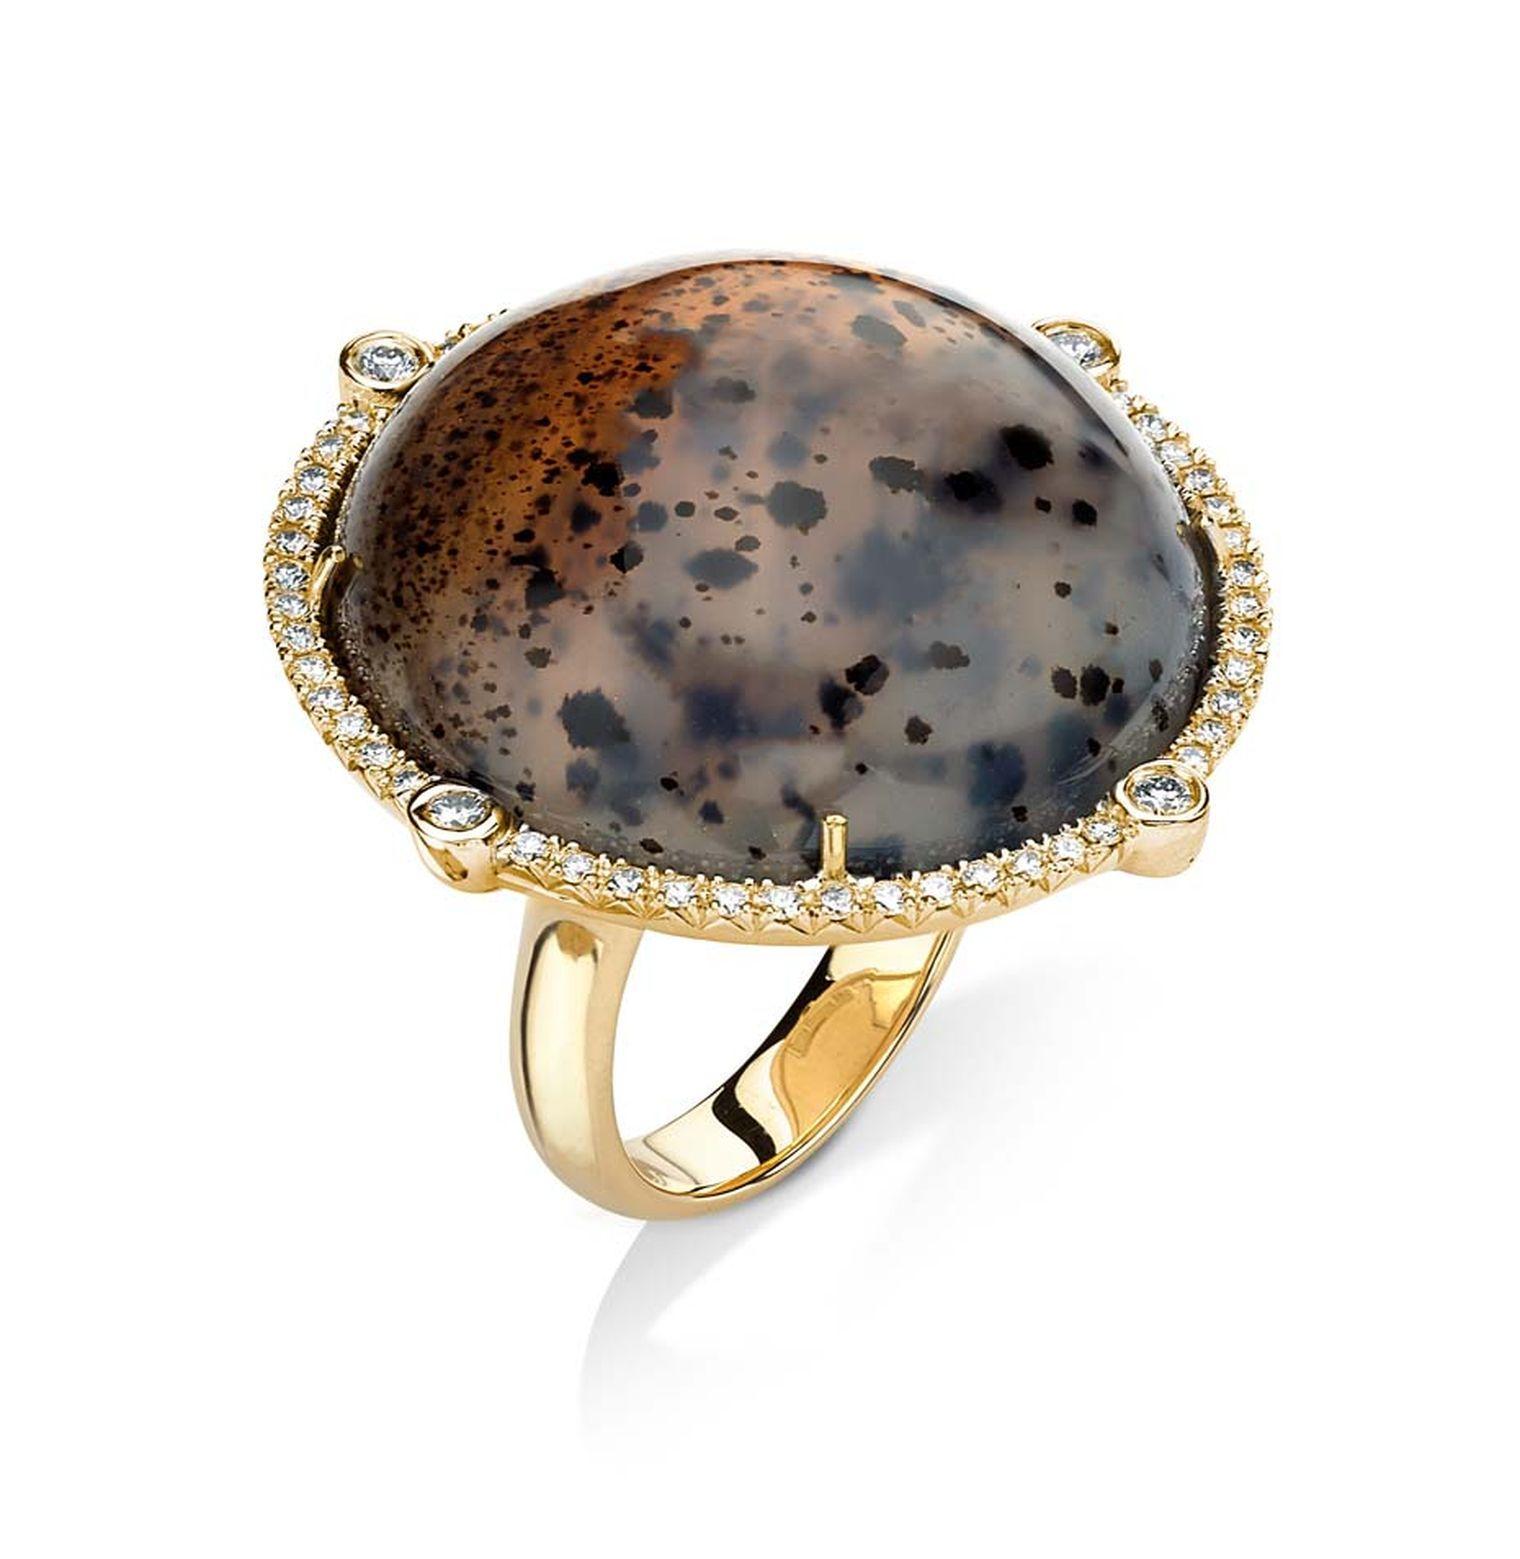 Pamela Huizenga gold ring with a 49.70ct Montana agate and diamond pavé.